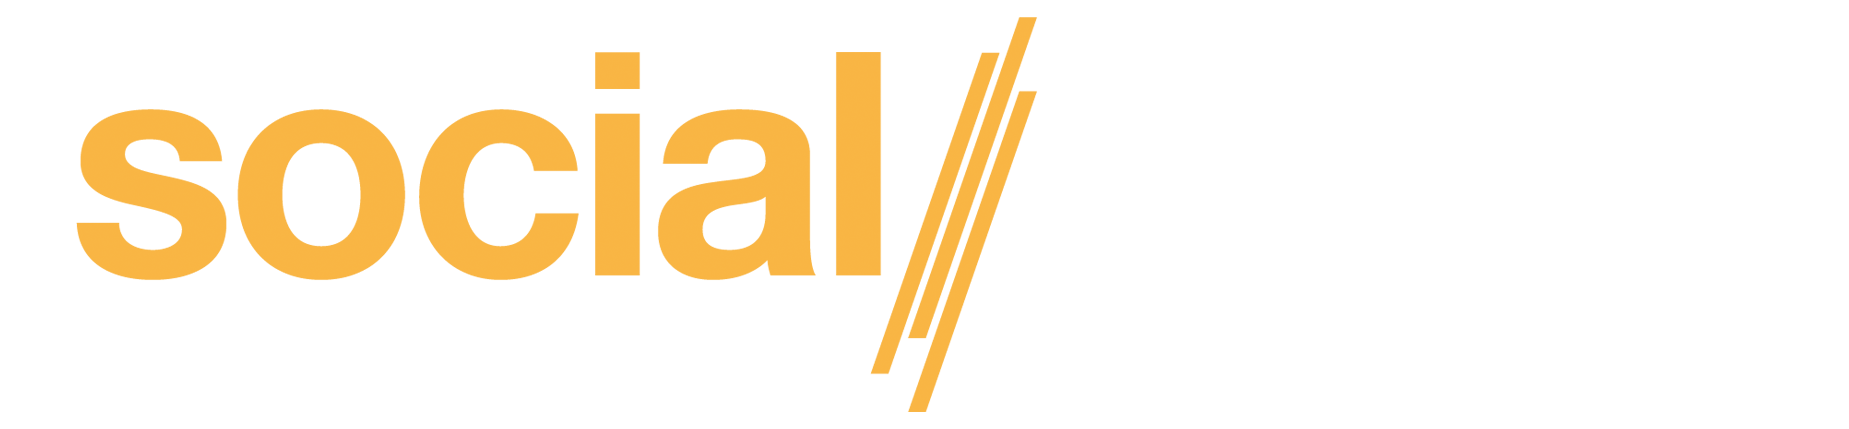 Social Estate